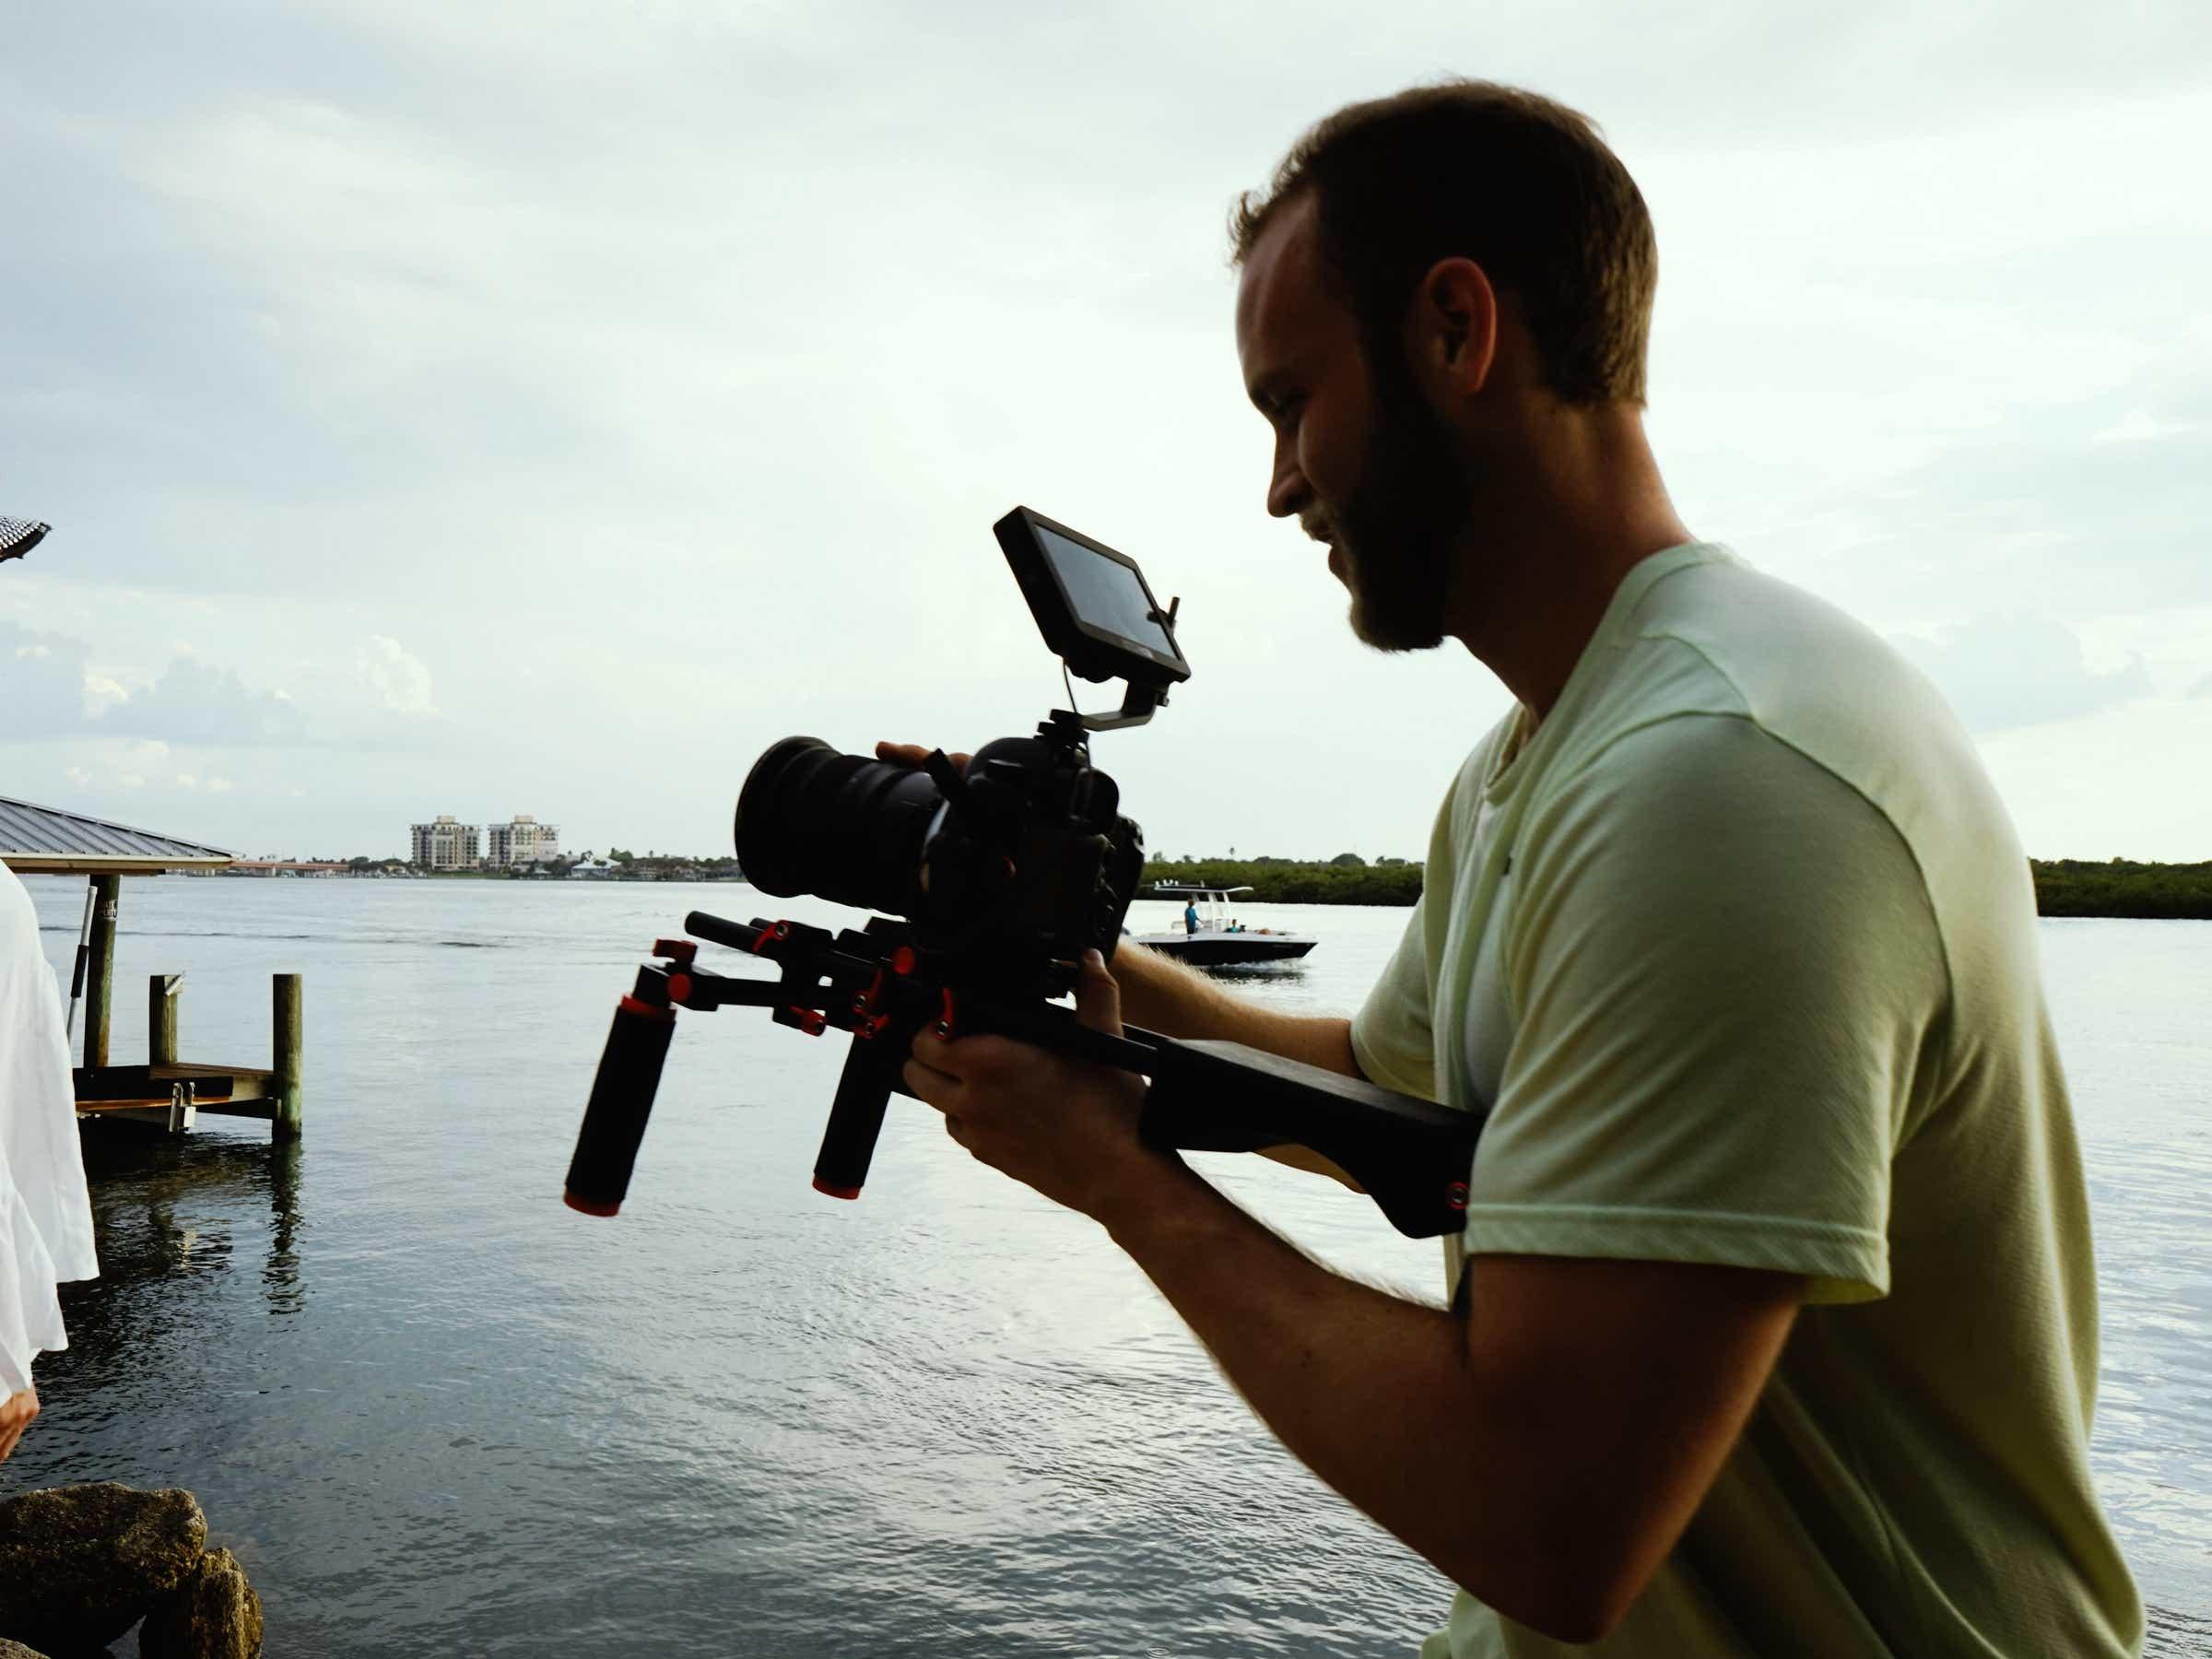 Videographer Job Description